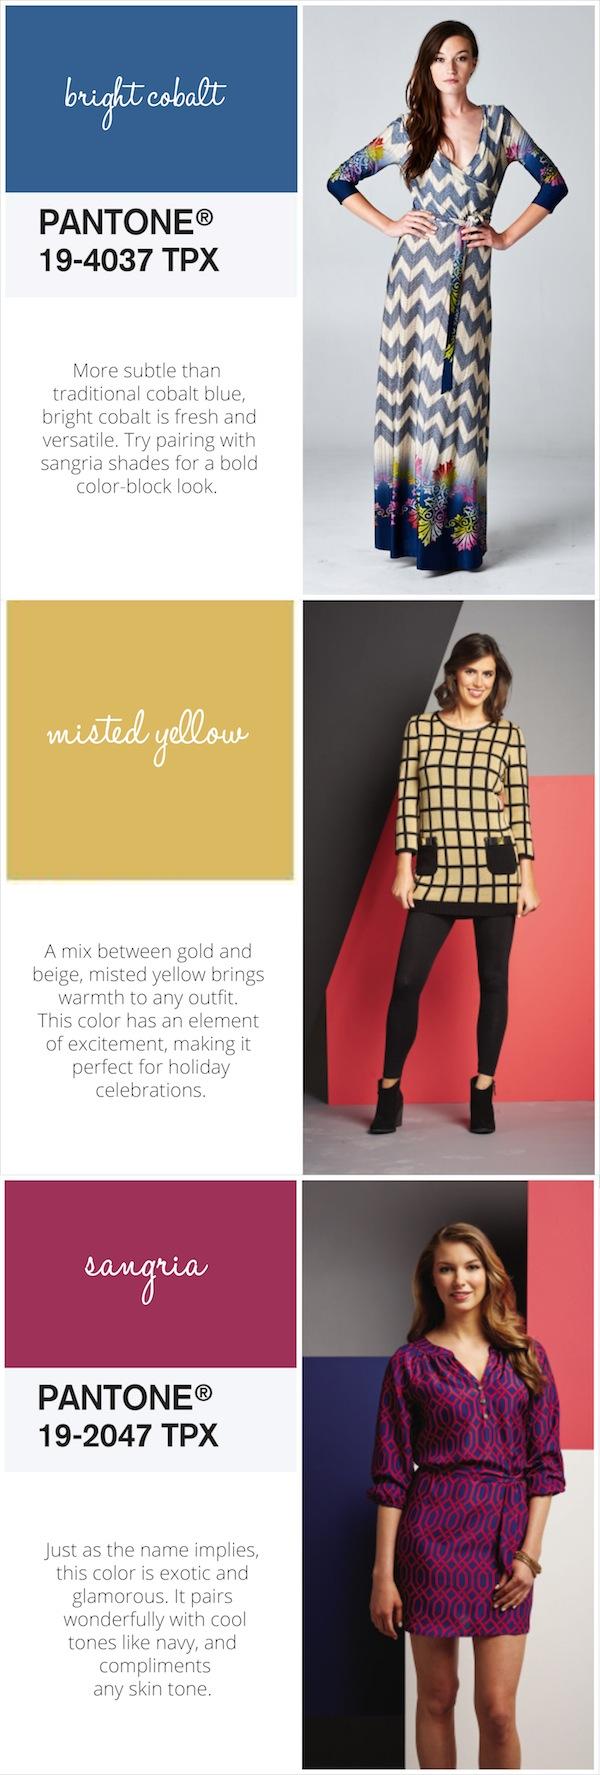 pantone 2014 color trend